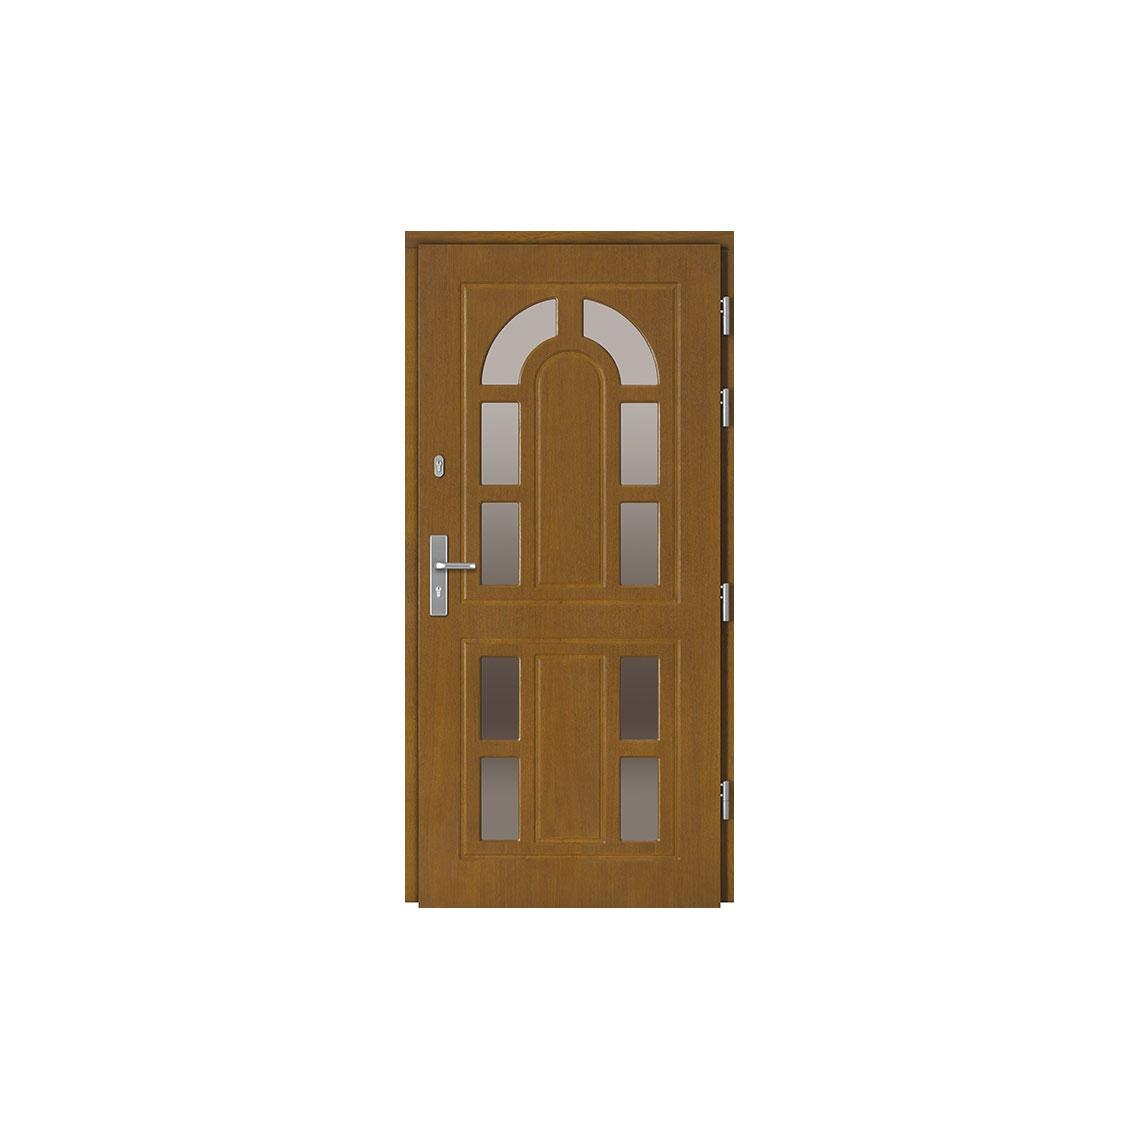 Koka durvis WD-1